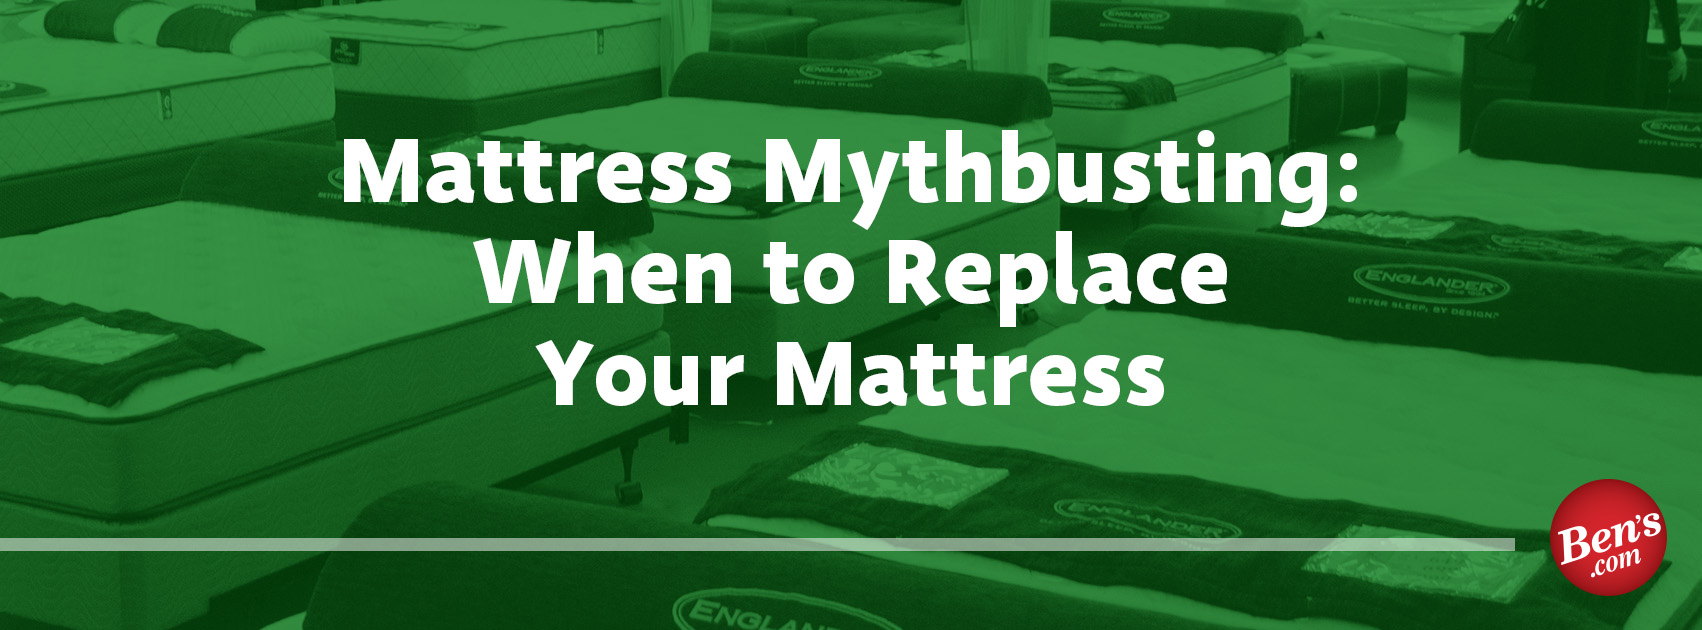 06-30_6_Mattress_Mythbusting